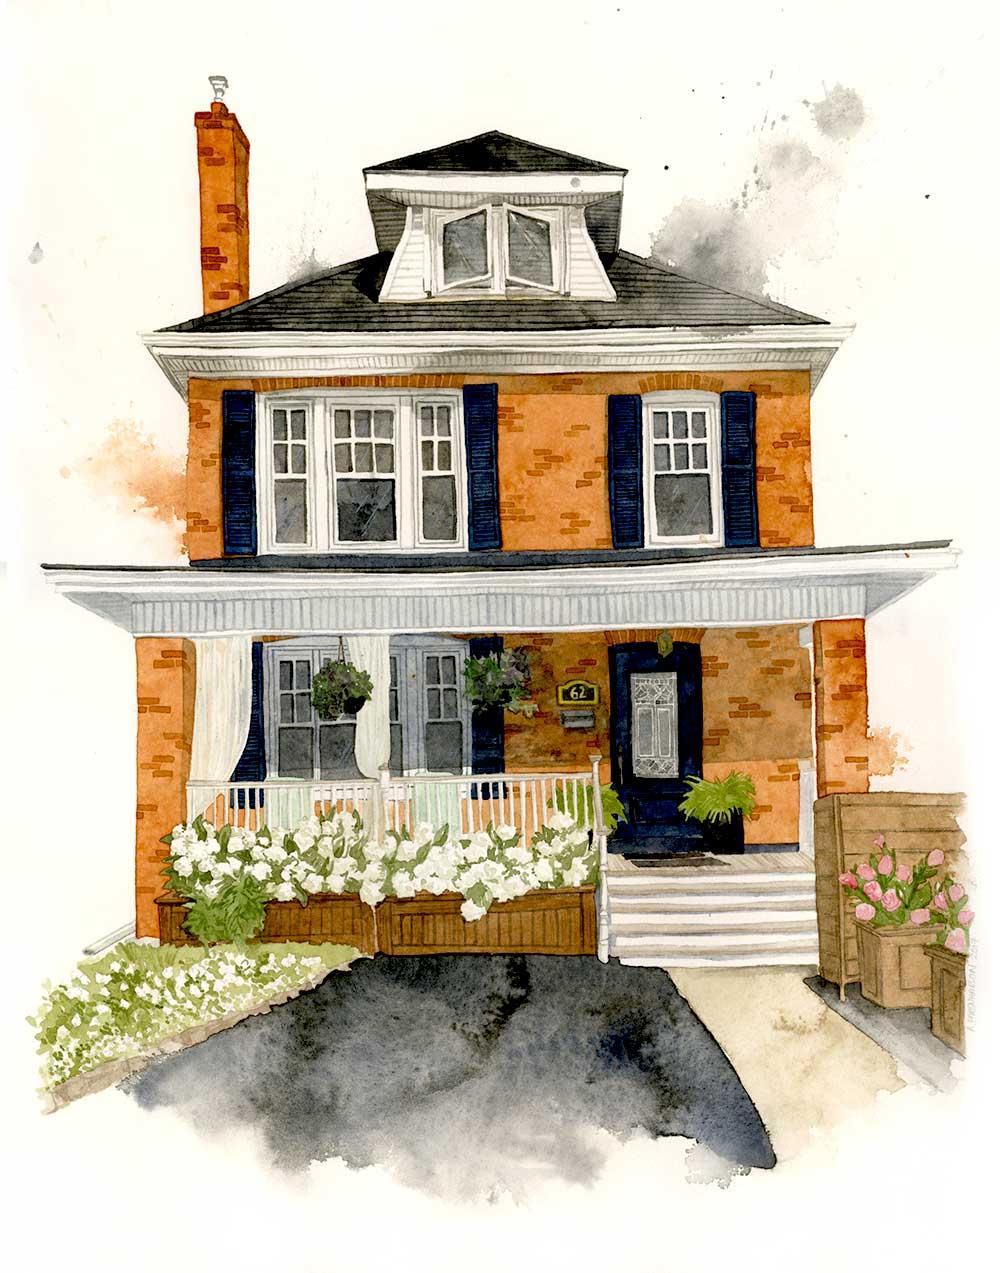 Charlotte-House-Painting-by-Amanda-Farquharson.jpg